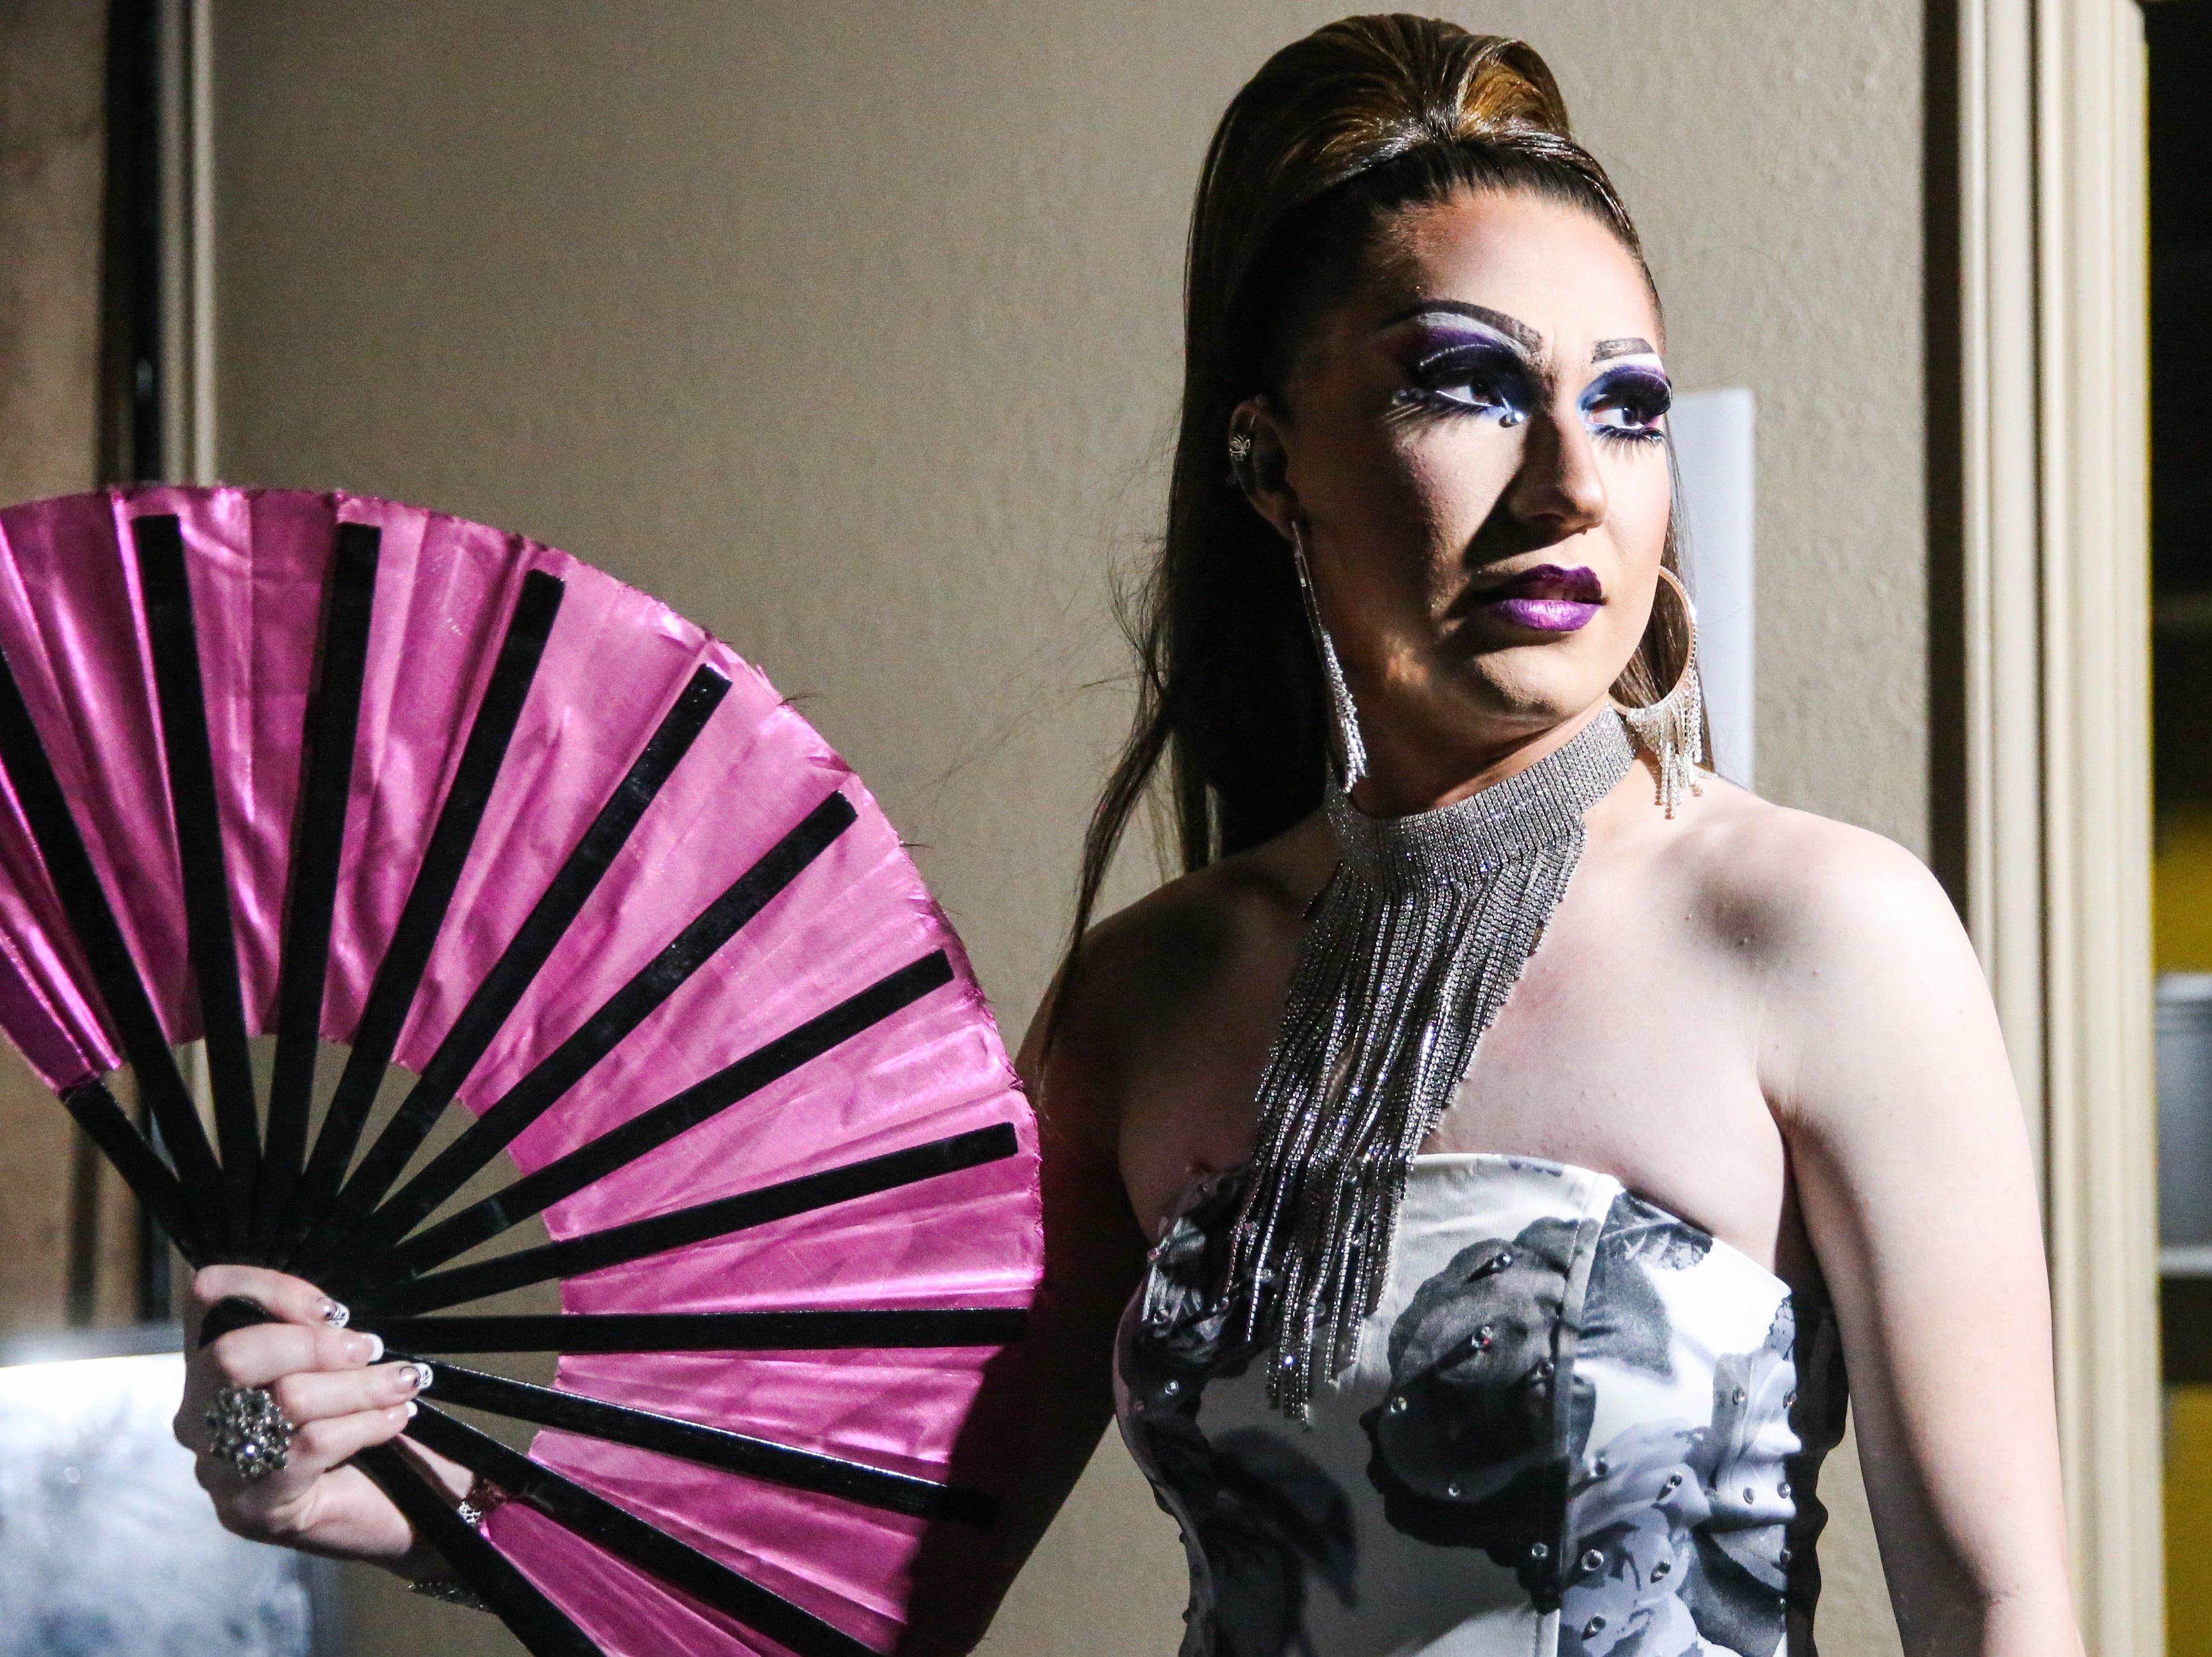 Zelieghia Reignz Paris tries out a fan before the drag show Friday, April 19, 2019, at the Beauregard.